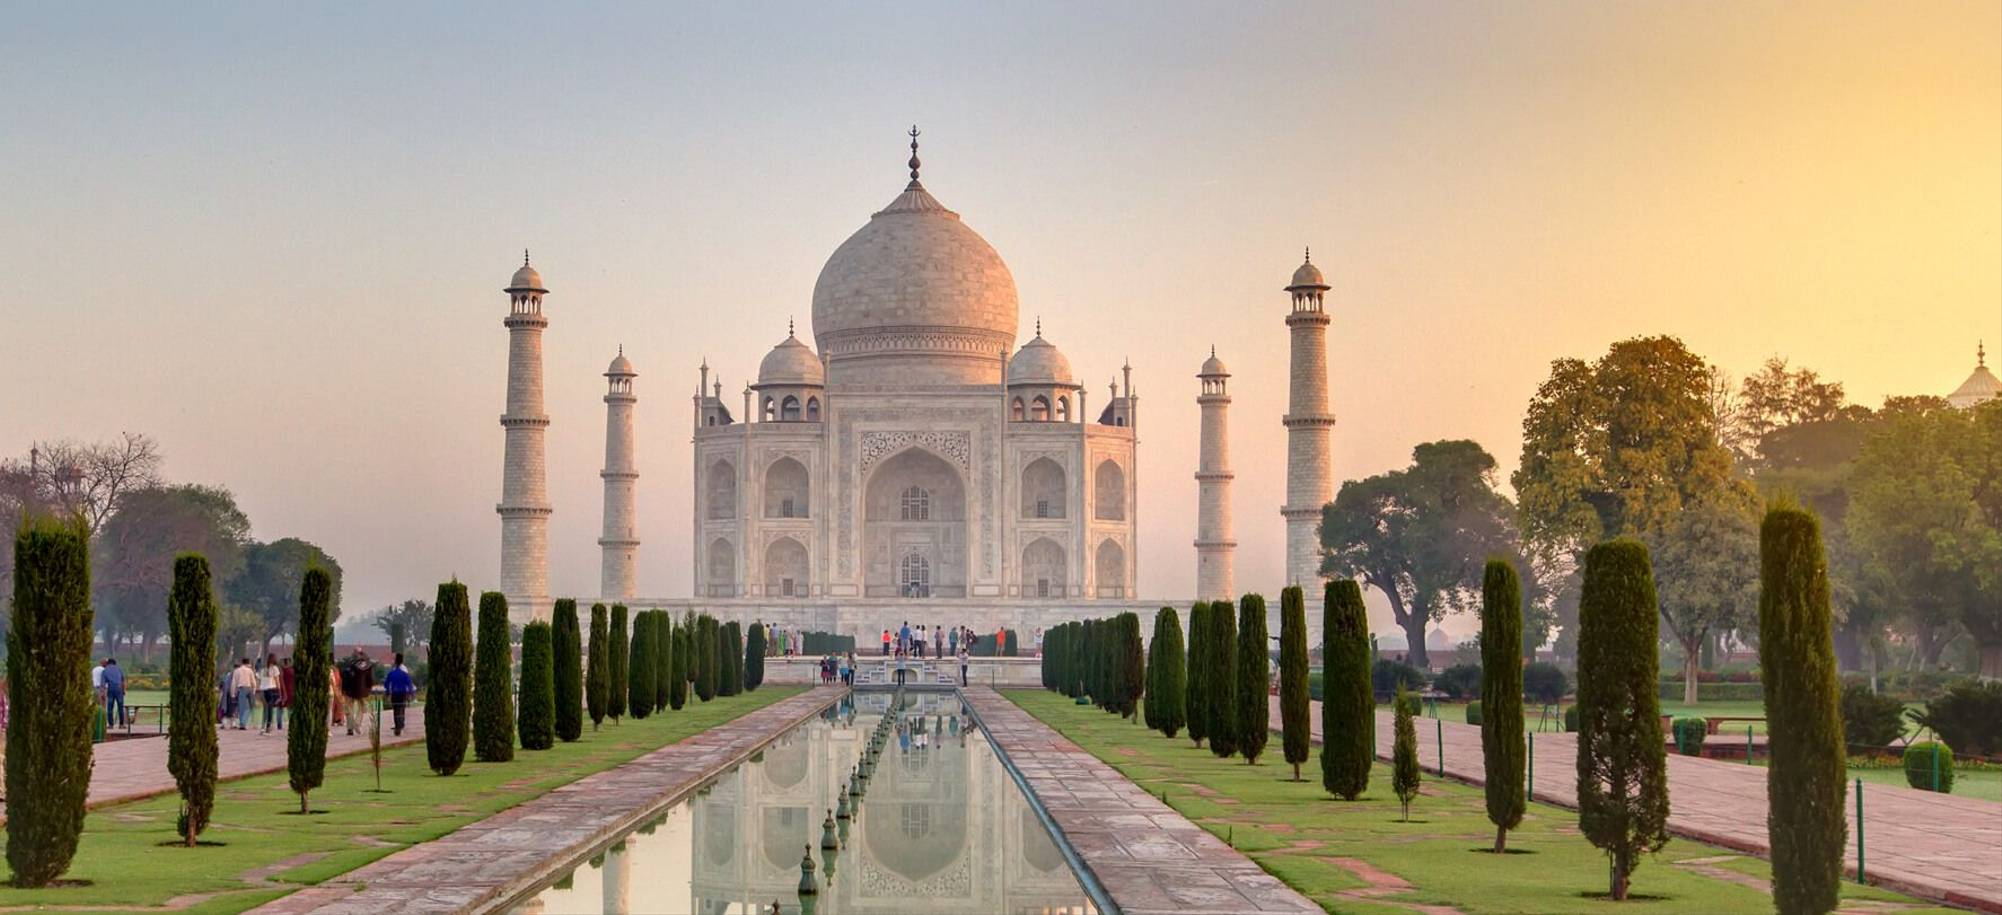 21 Day - Agra, Taj Mahal -Itinerary Desktop.jpg